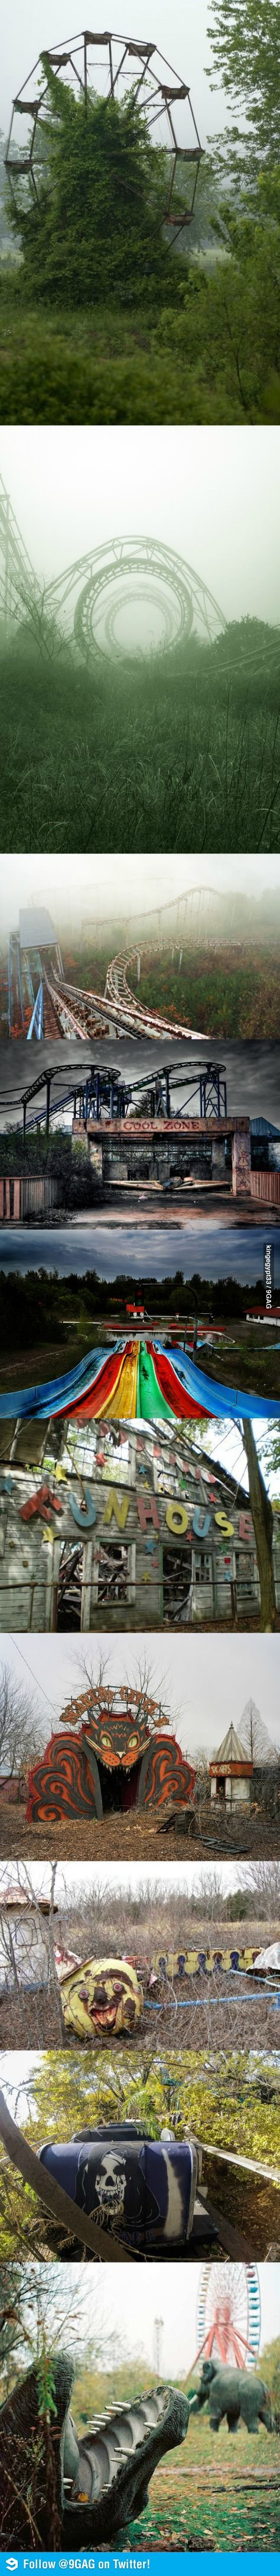 creepy abandoned amusement parks.